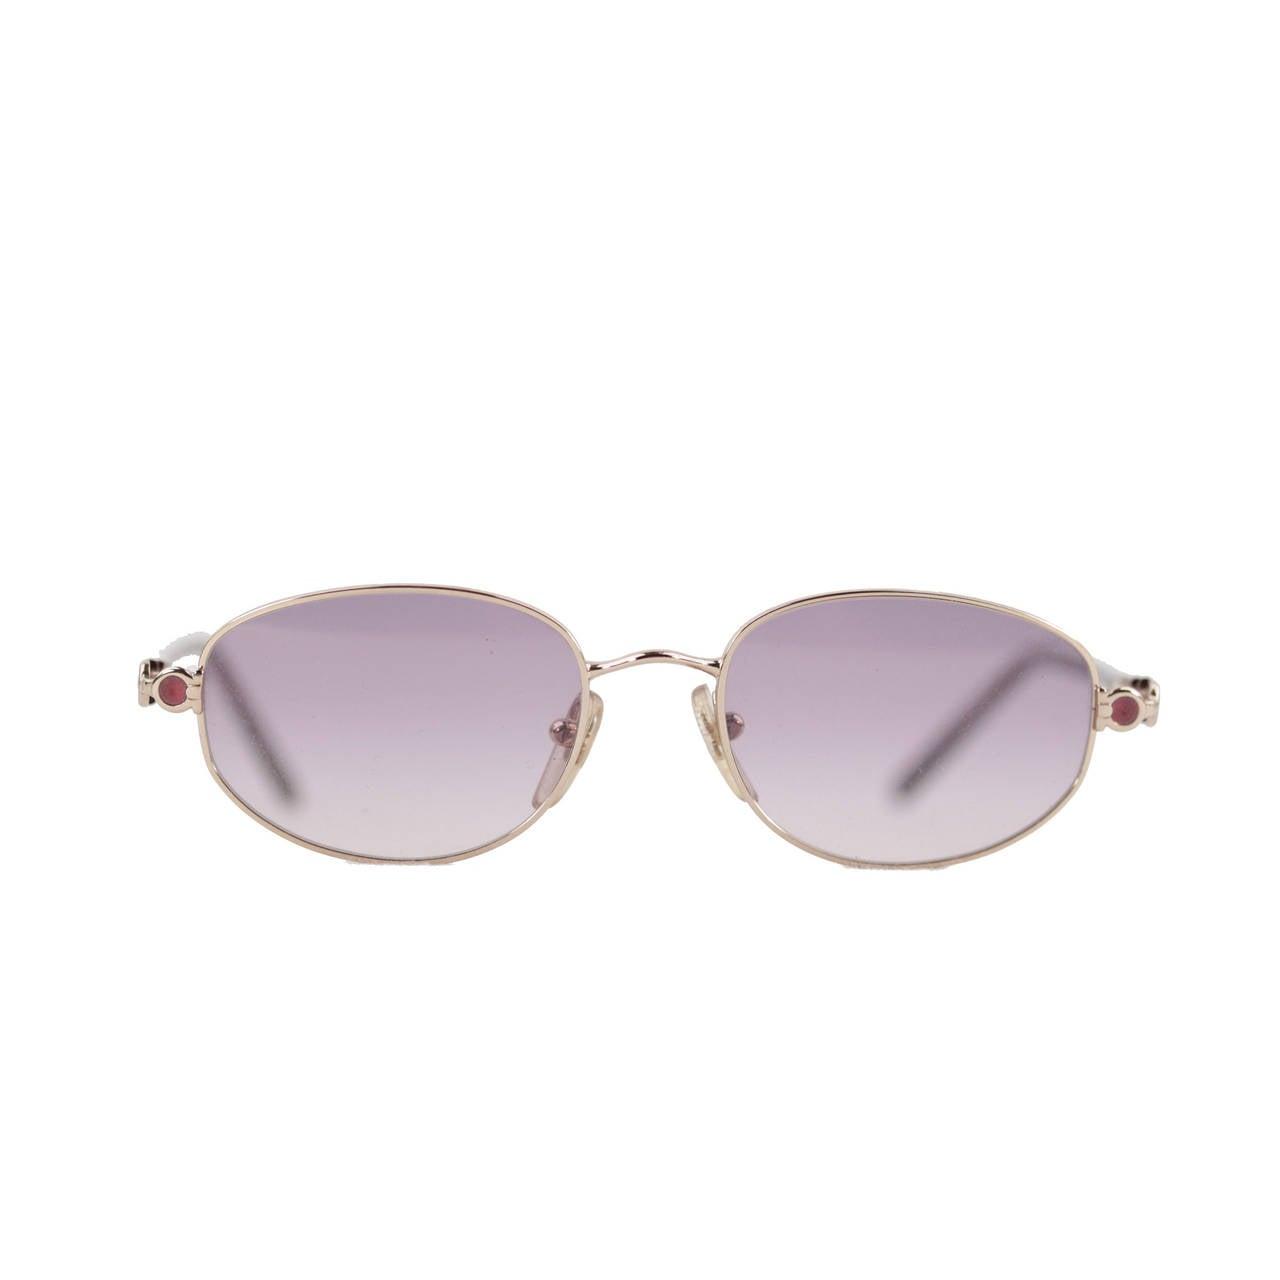 SALVATORE FERRAGAMO vintage SUNGLASSES 1546 599 51/18 130 Gancini Eyewear